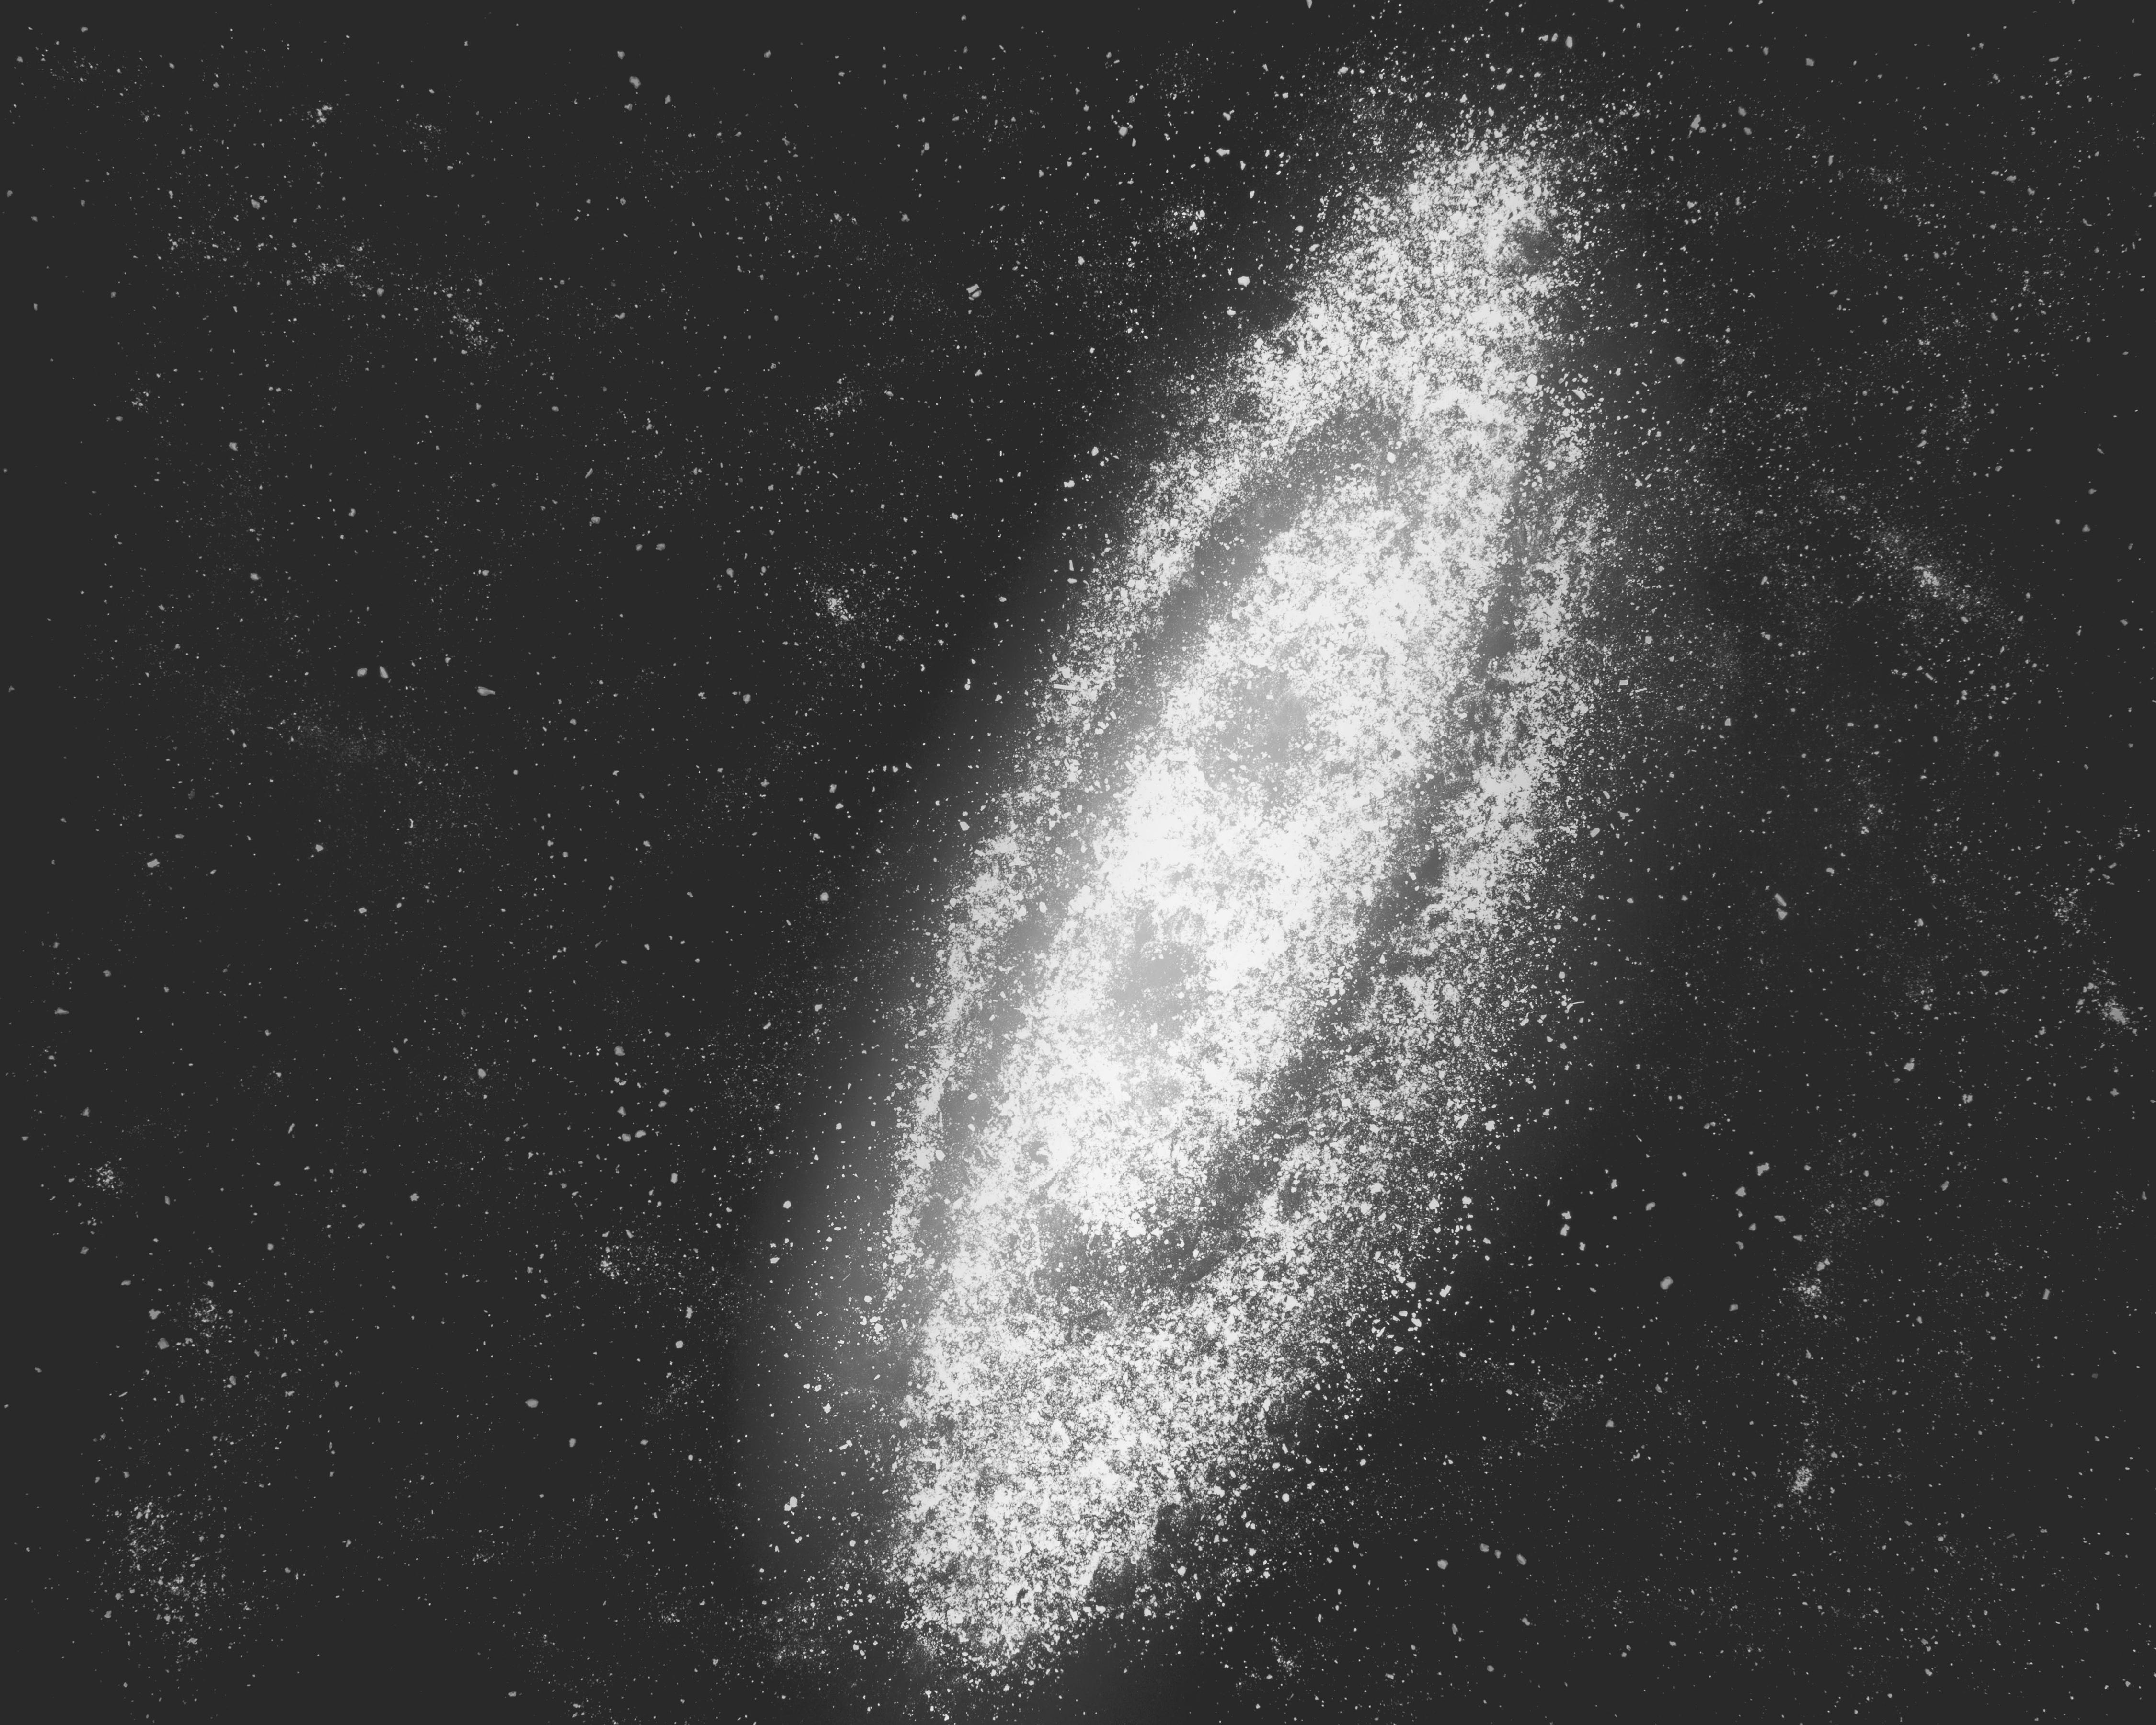 Image of Galaxy II by Alan Knox